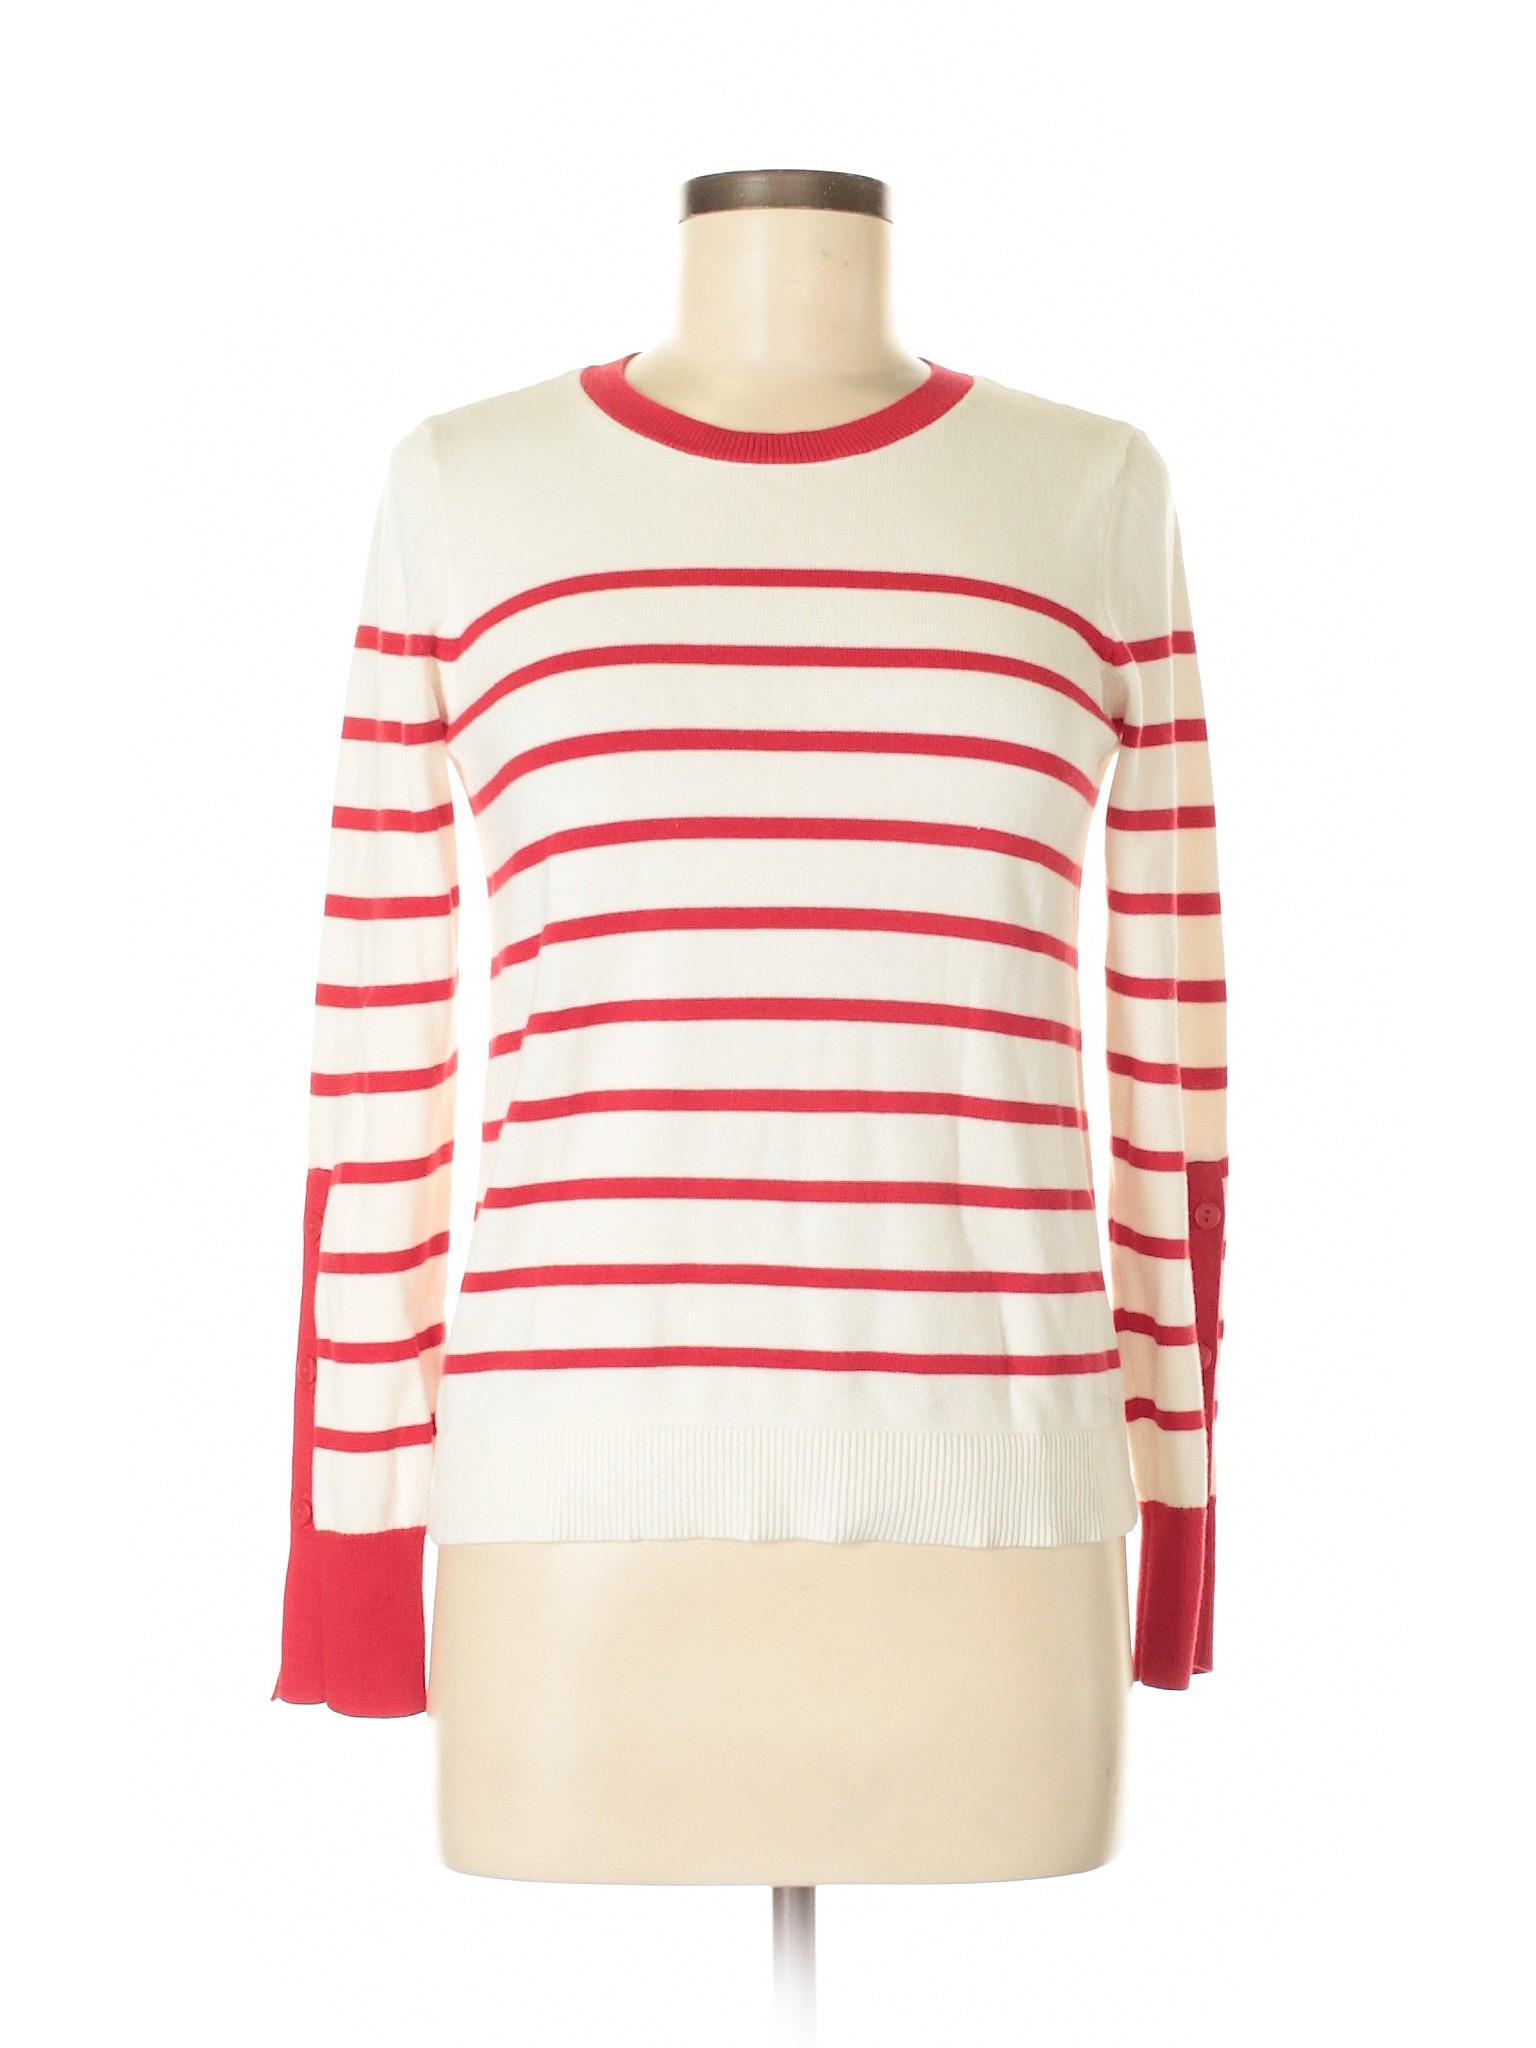 Taylor LOFT Pullover Boutique Sweater Ann Outlet Sz6WaO